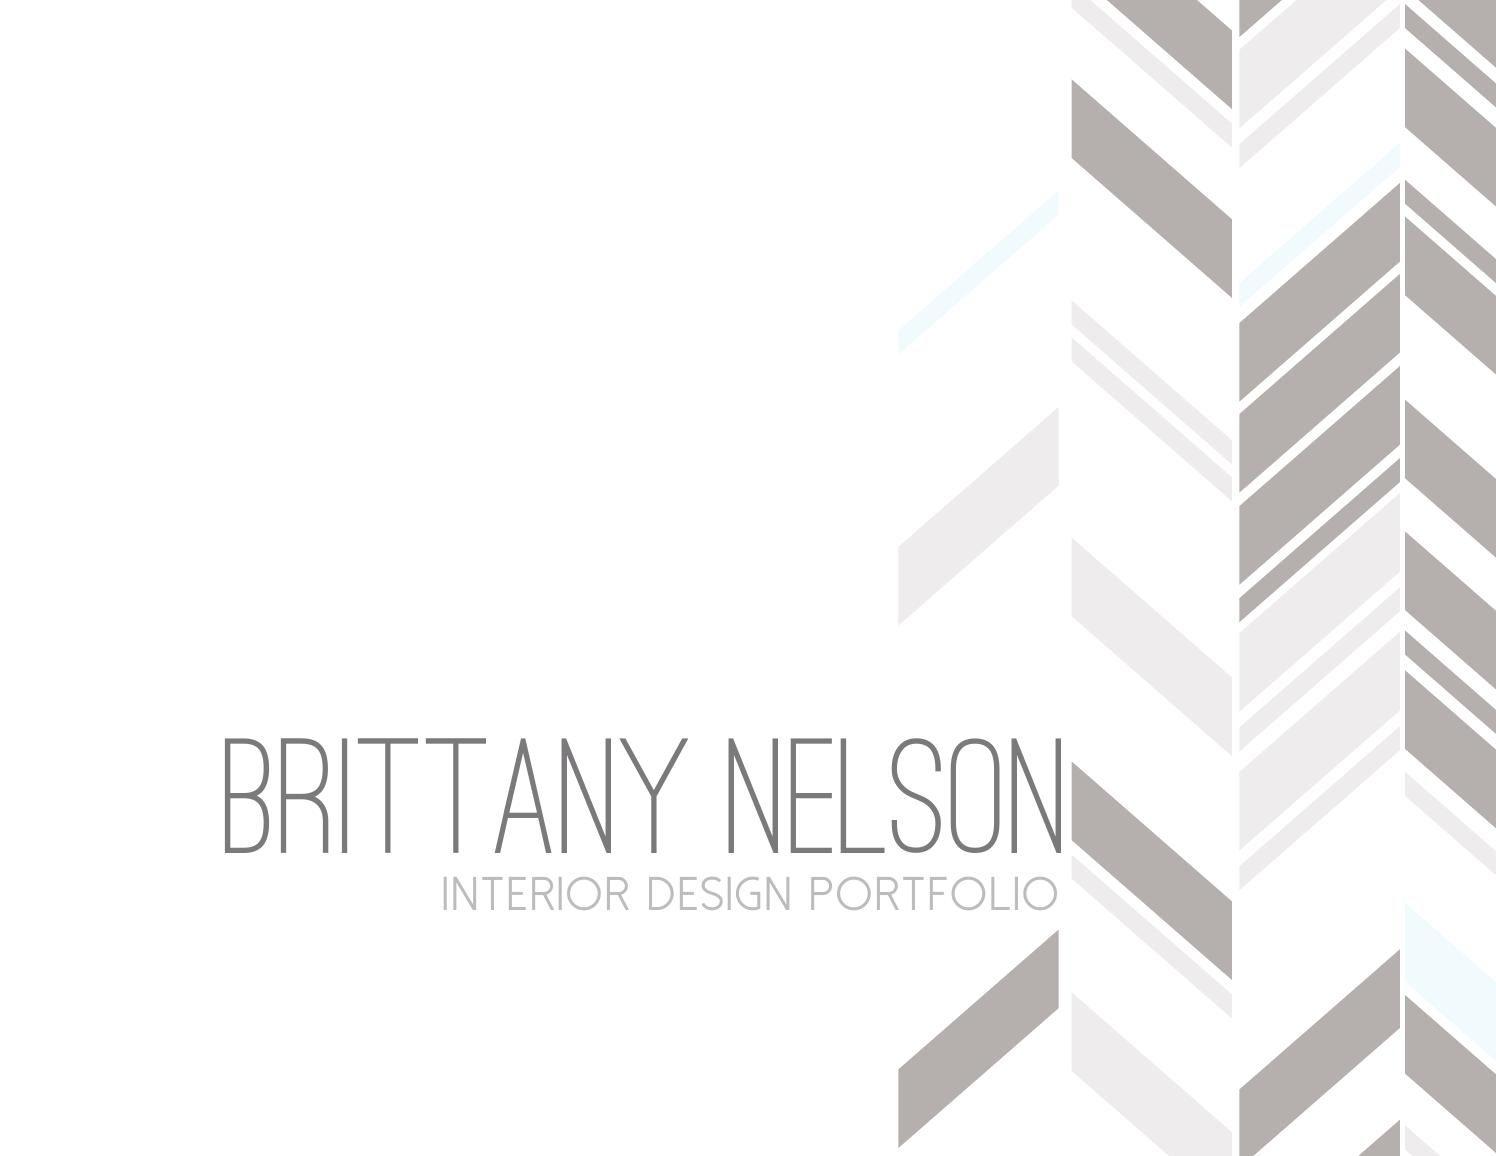 Brittany nelson interior design portfolio interior Fit interior design portfolio